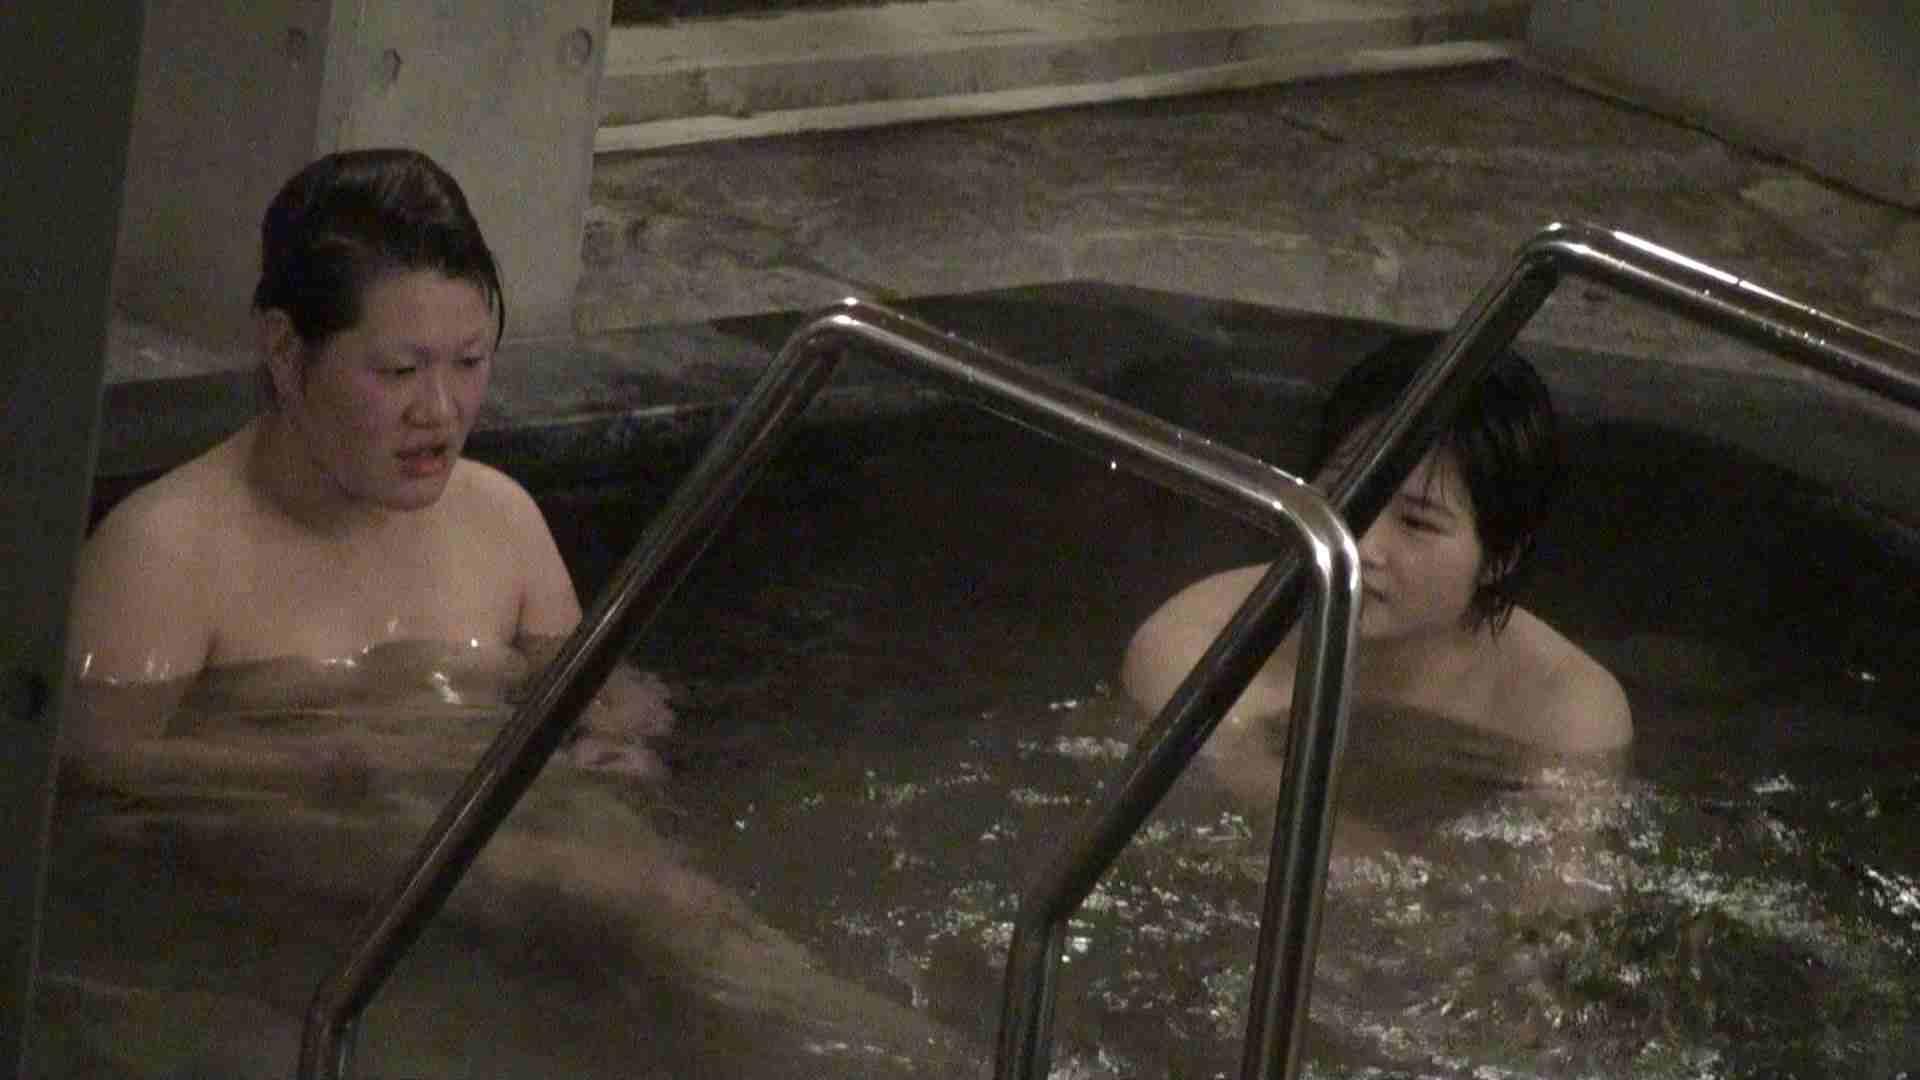 Aquaな露天風呂Vol.384 盗撮シリーズ | 露天風呂編  113PIX 83